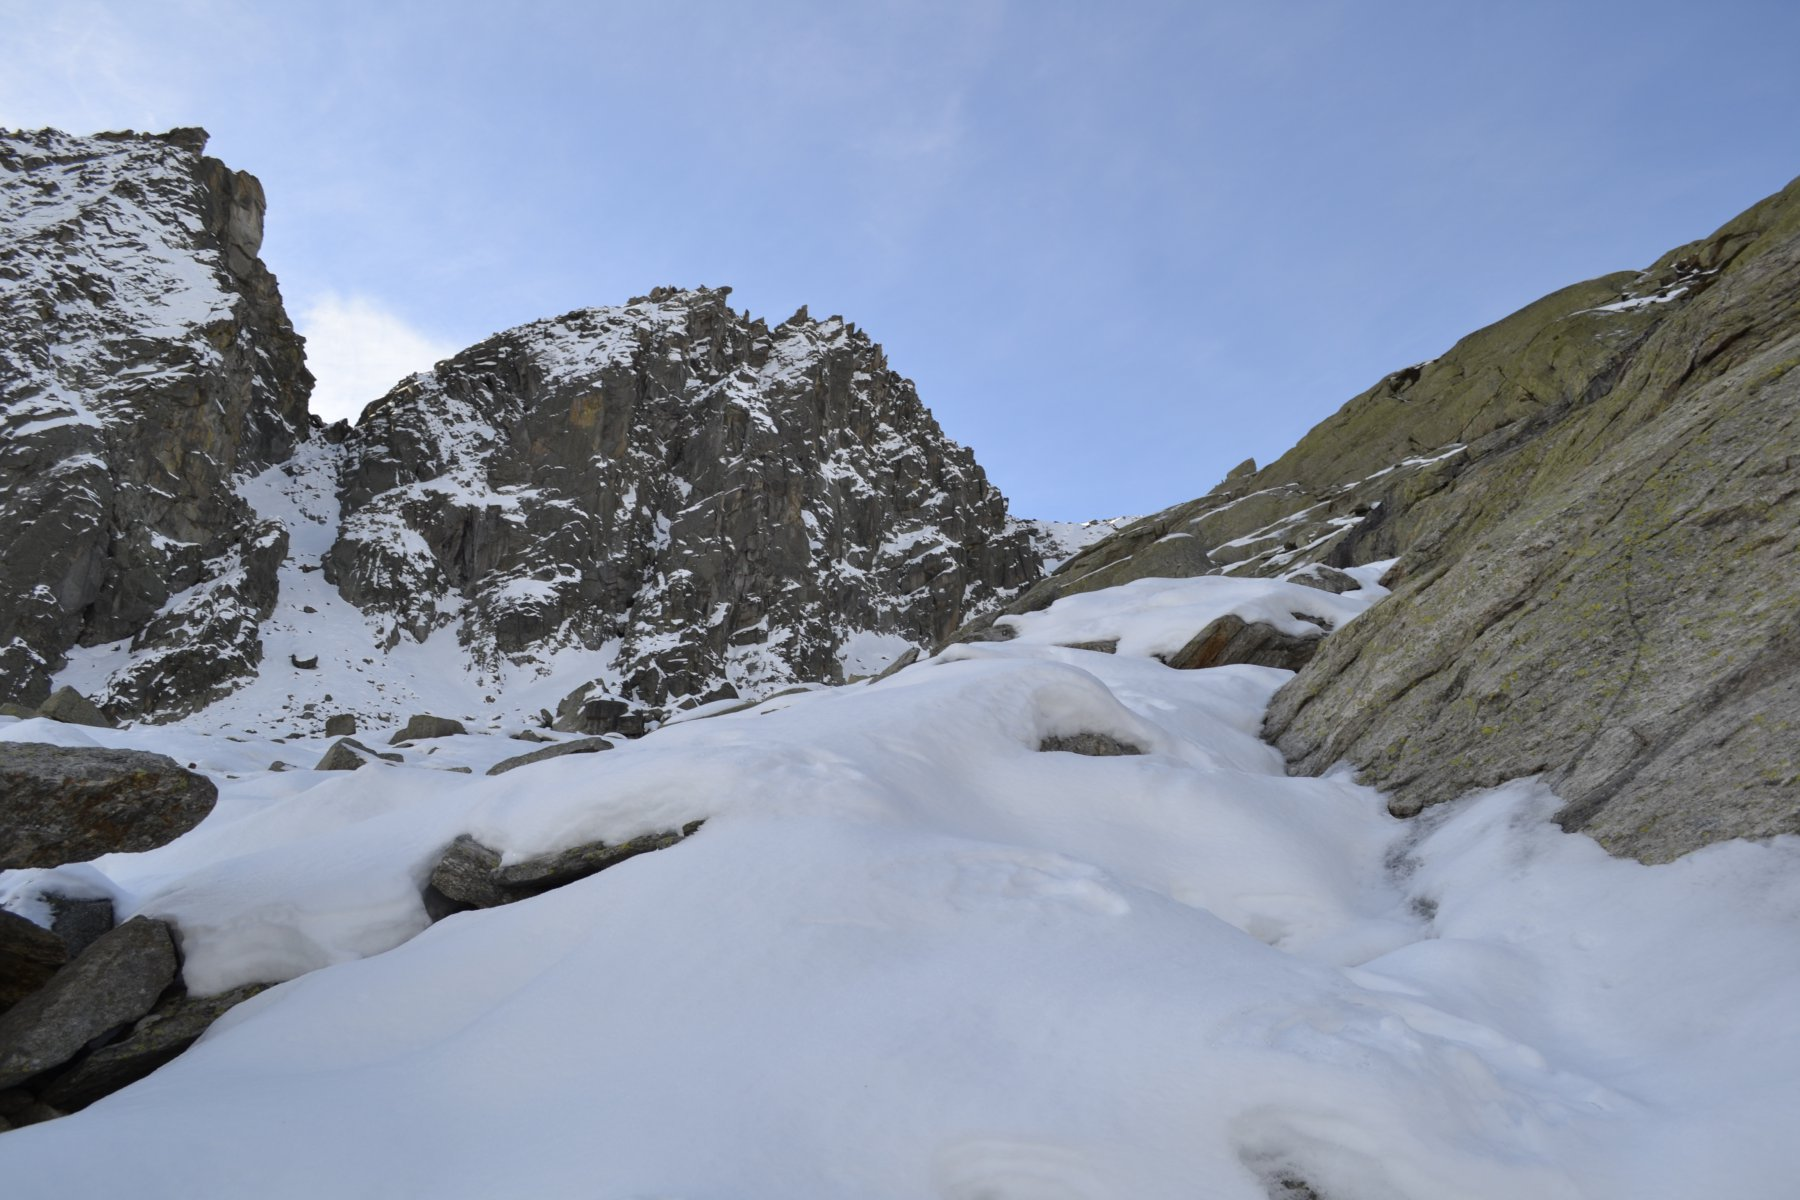 Neve sul sentiero